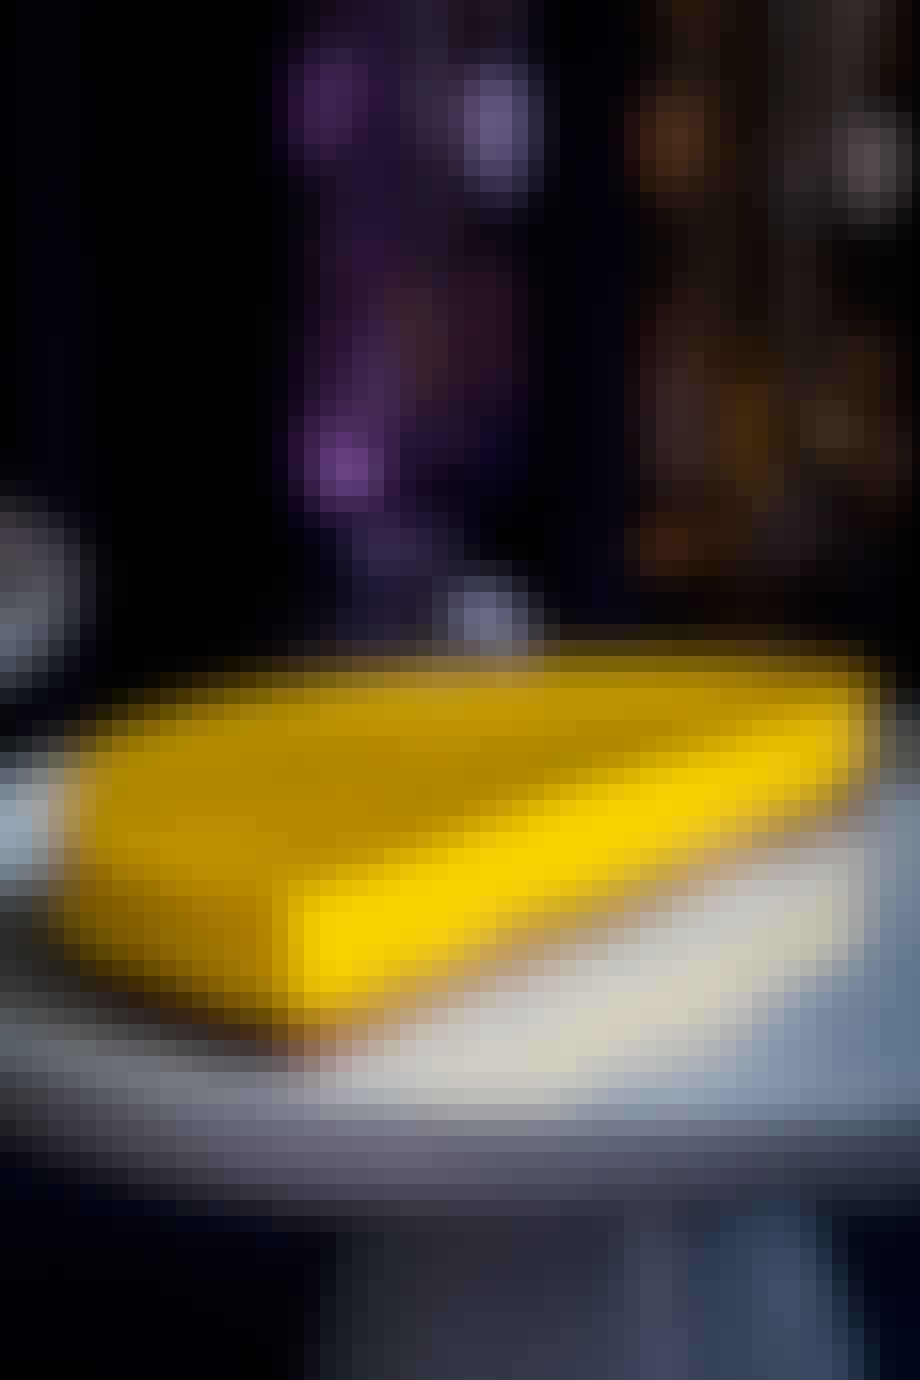 Gul citron cheesecake